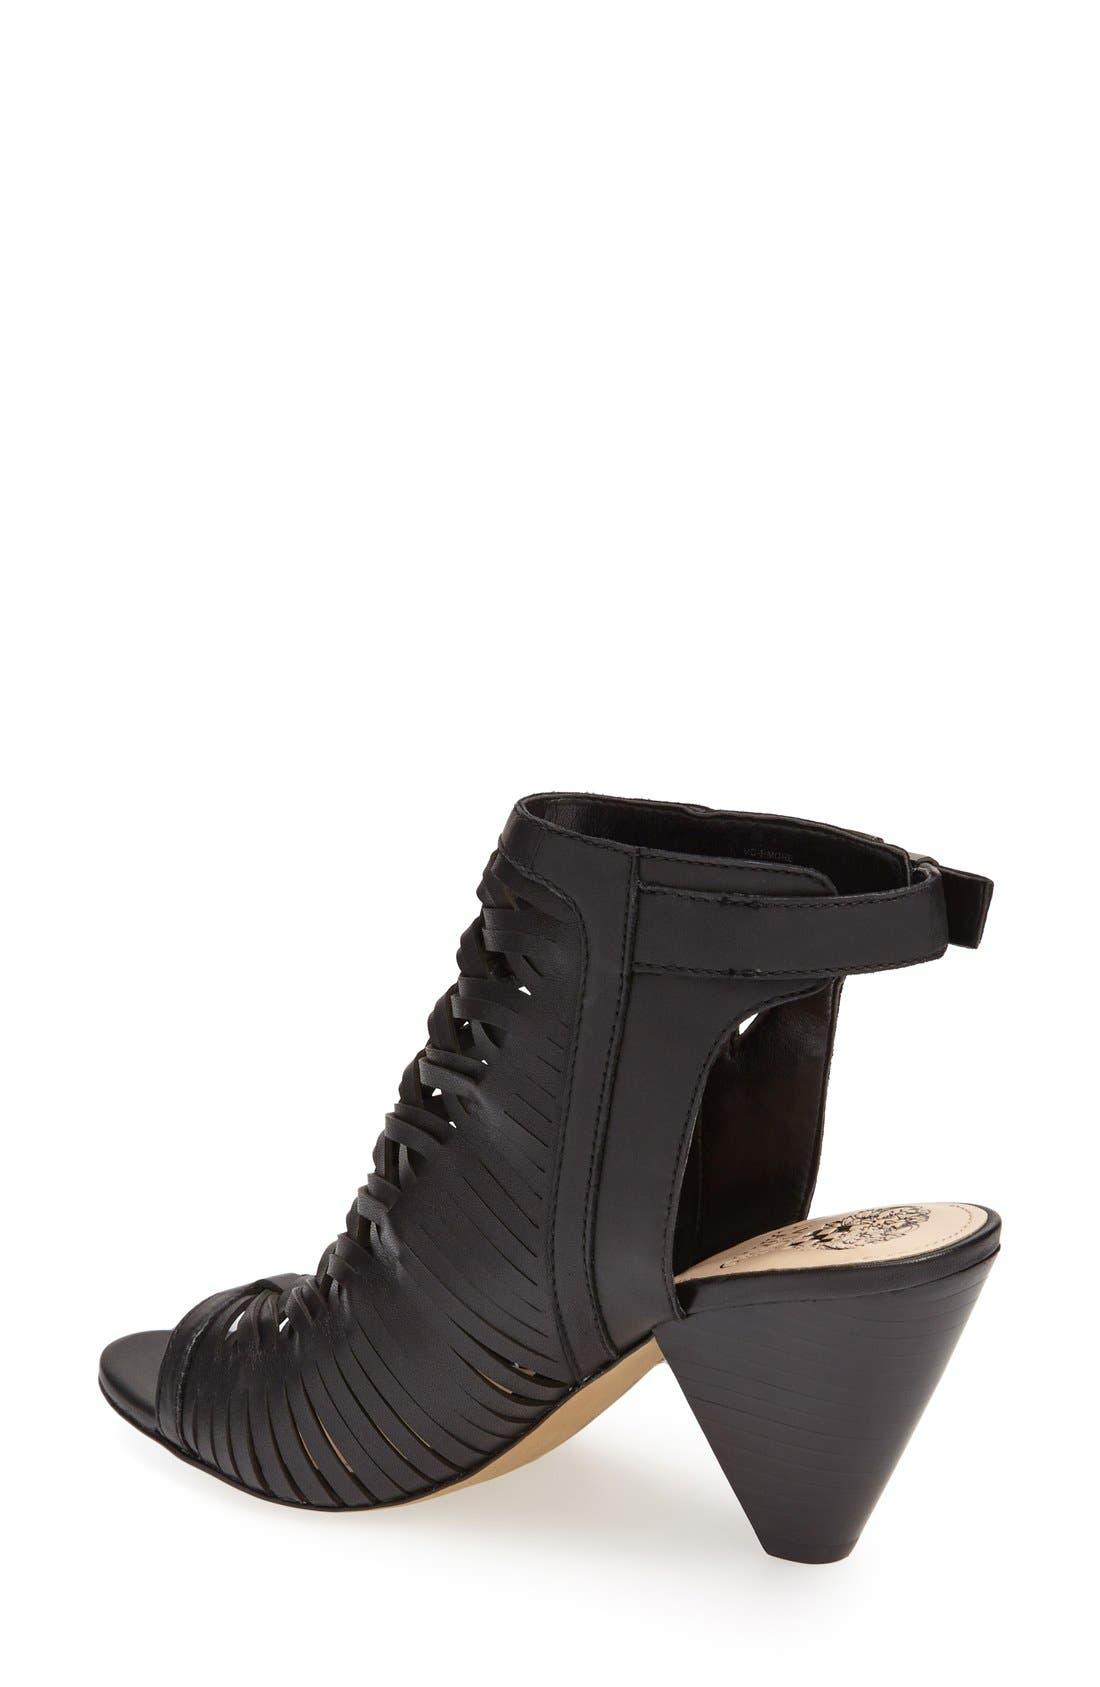 'Emore' Leather Sandal,                             Alternate thumbnail 2, color,                             001